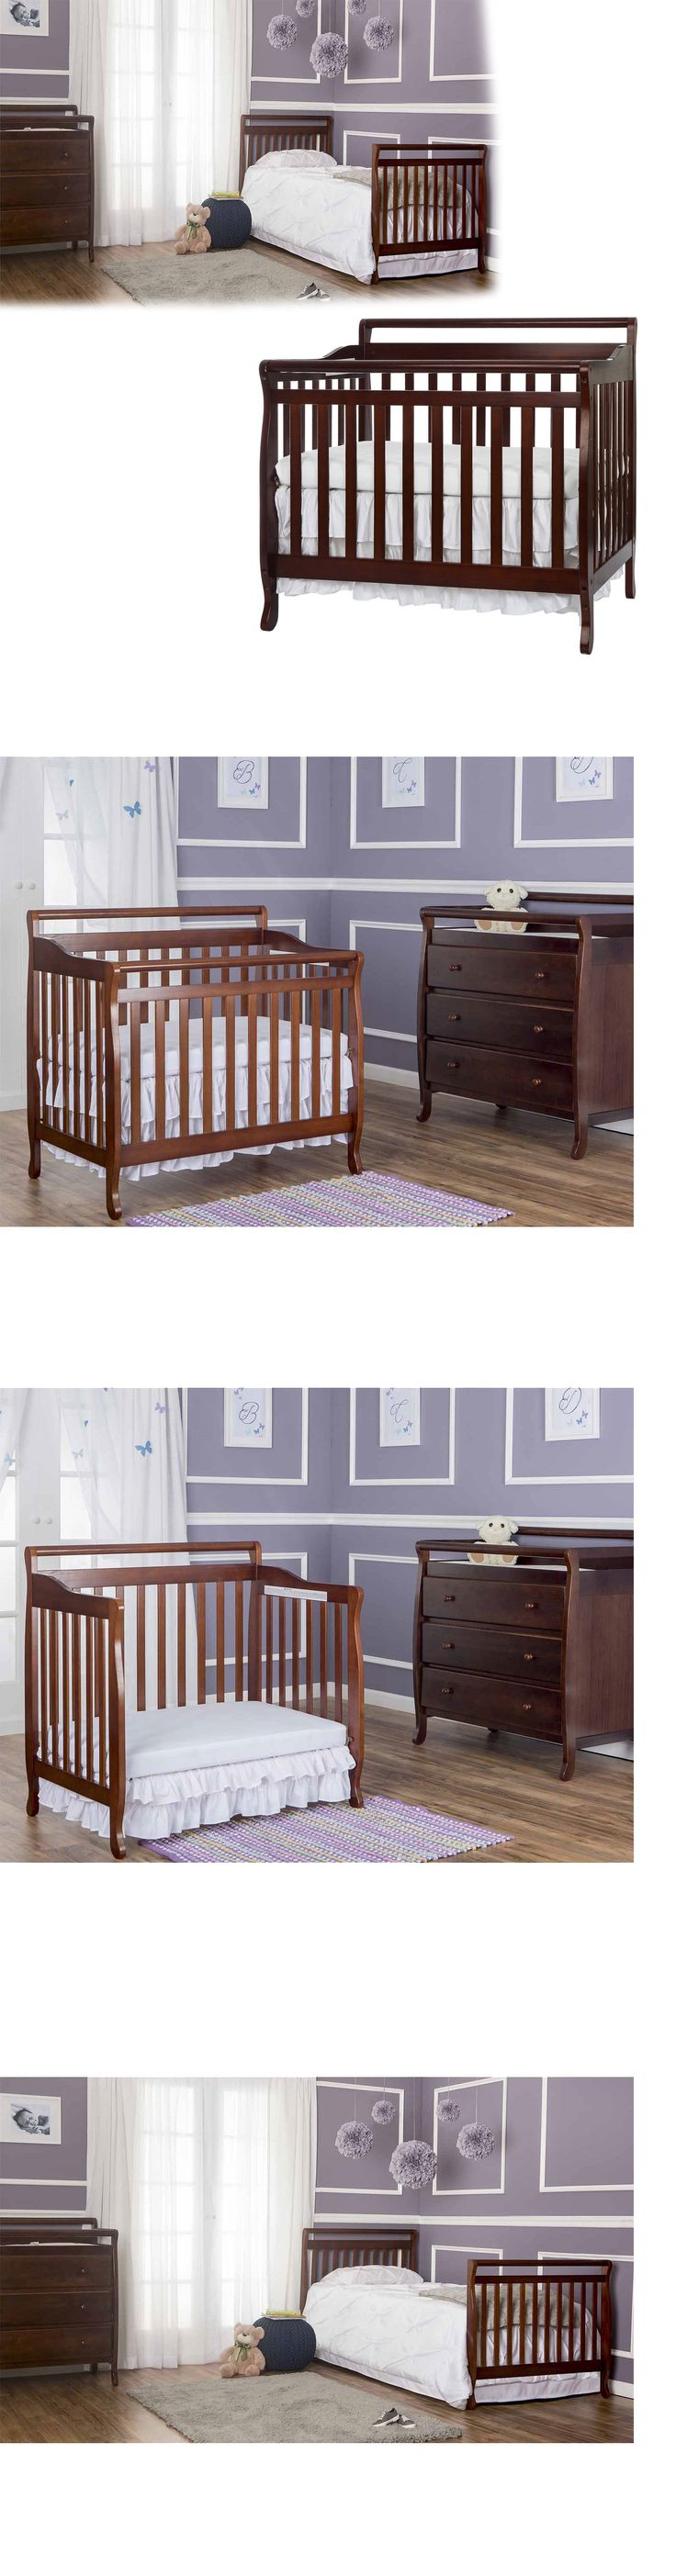 Best 25 Convertible baby cribs ideas on Pinterest